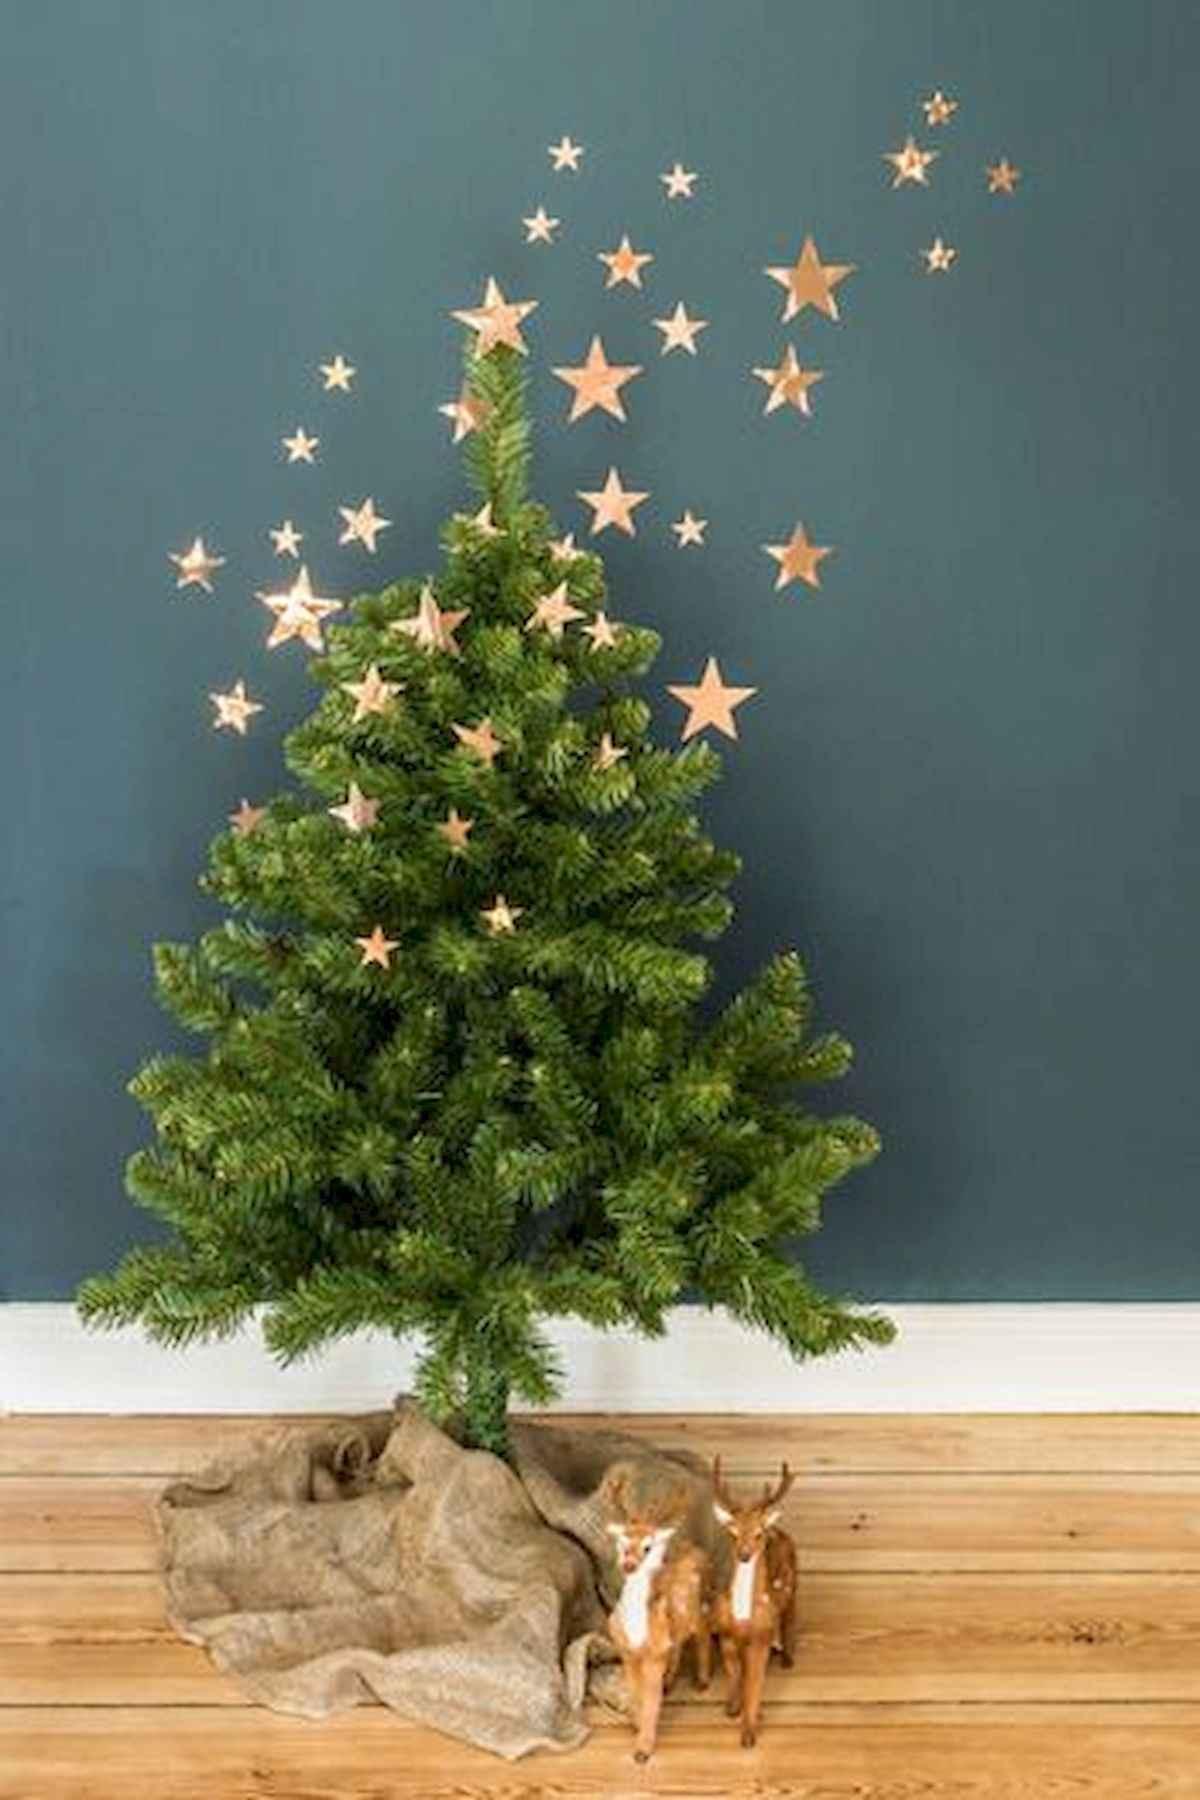 40 elegant christmas tree decorations ideas (14)